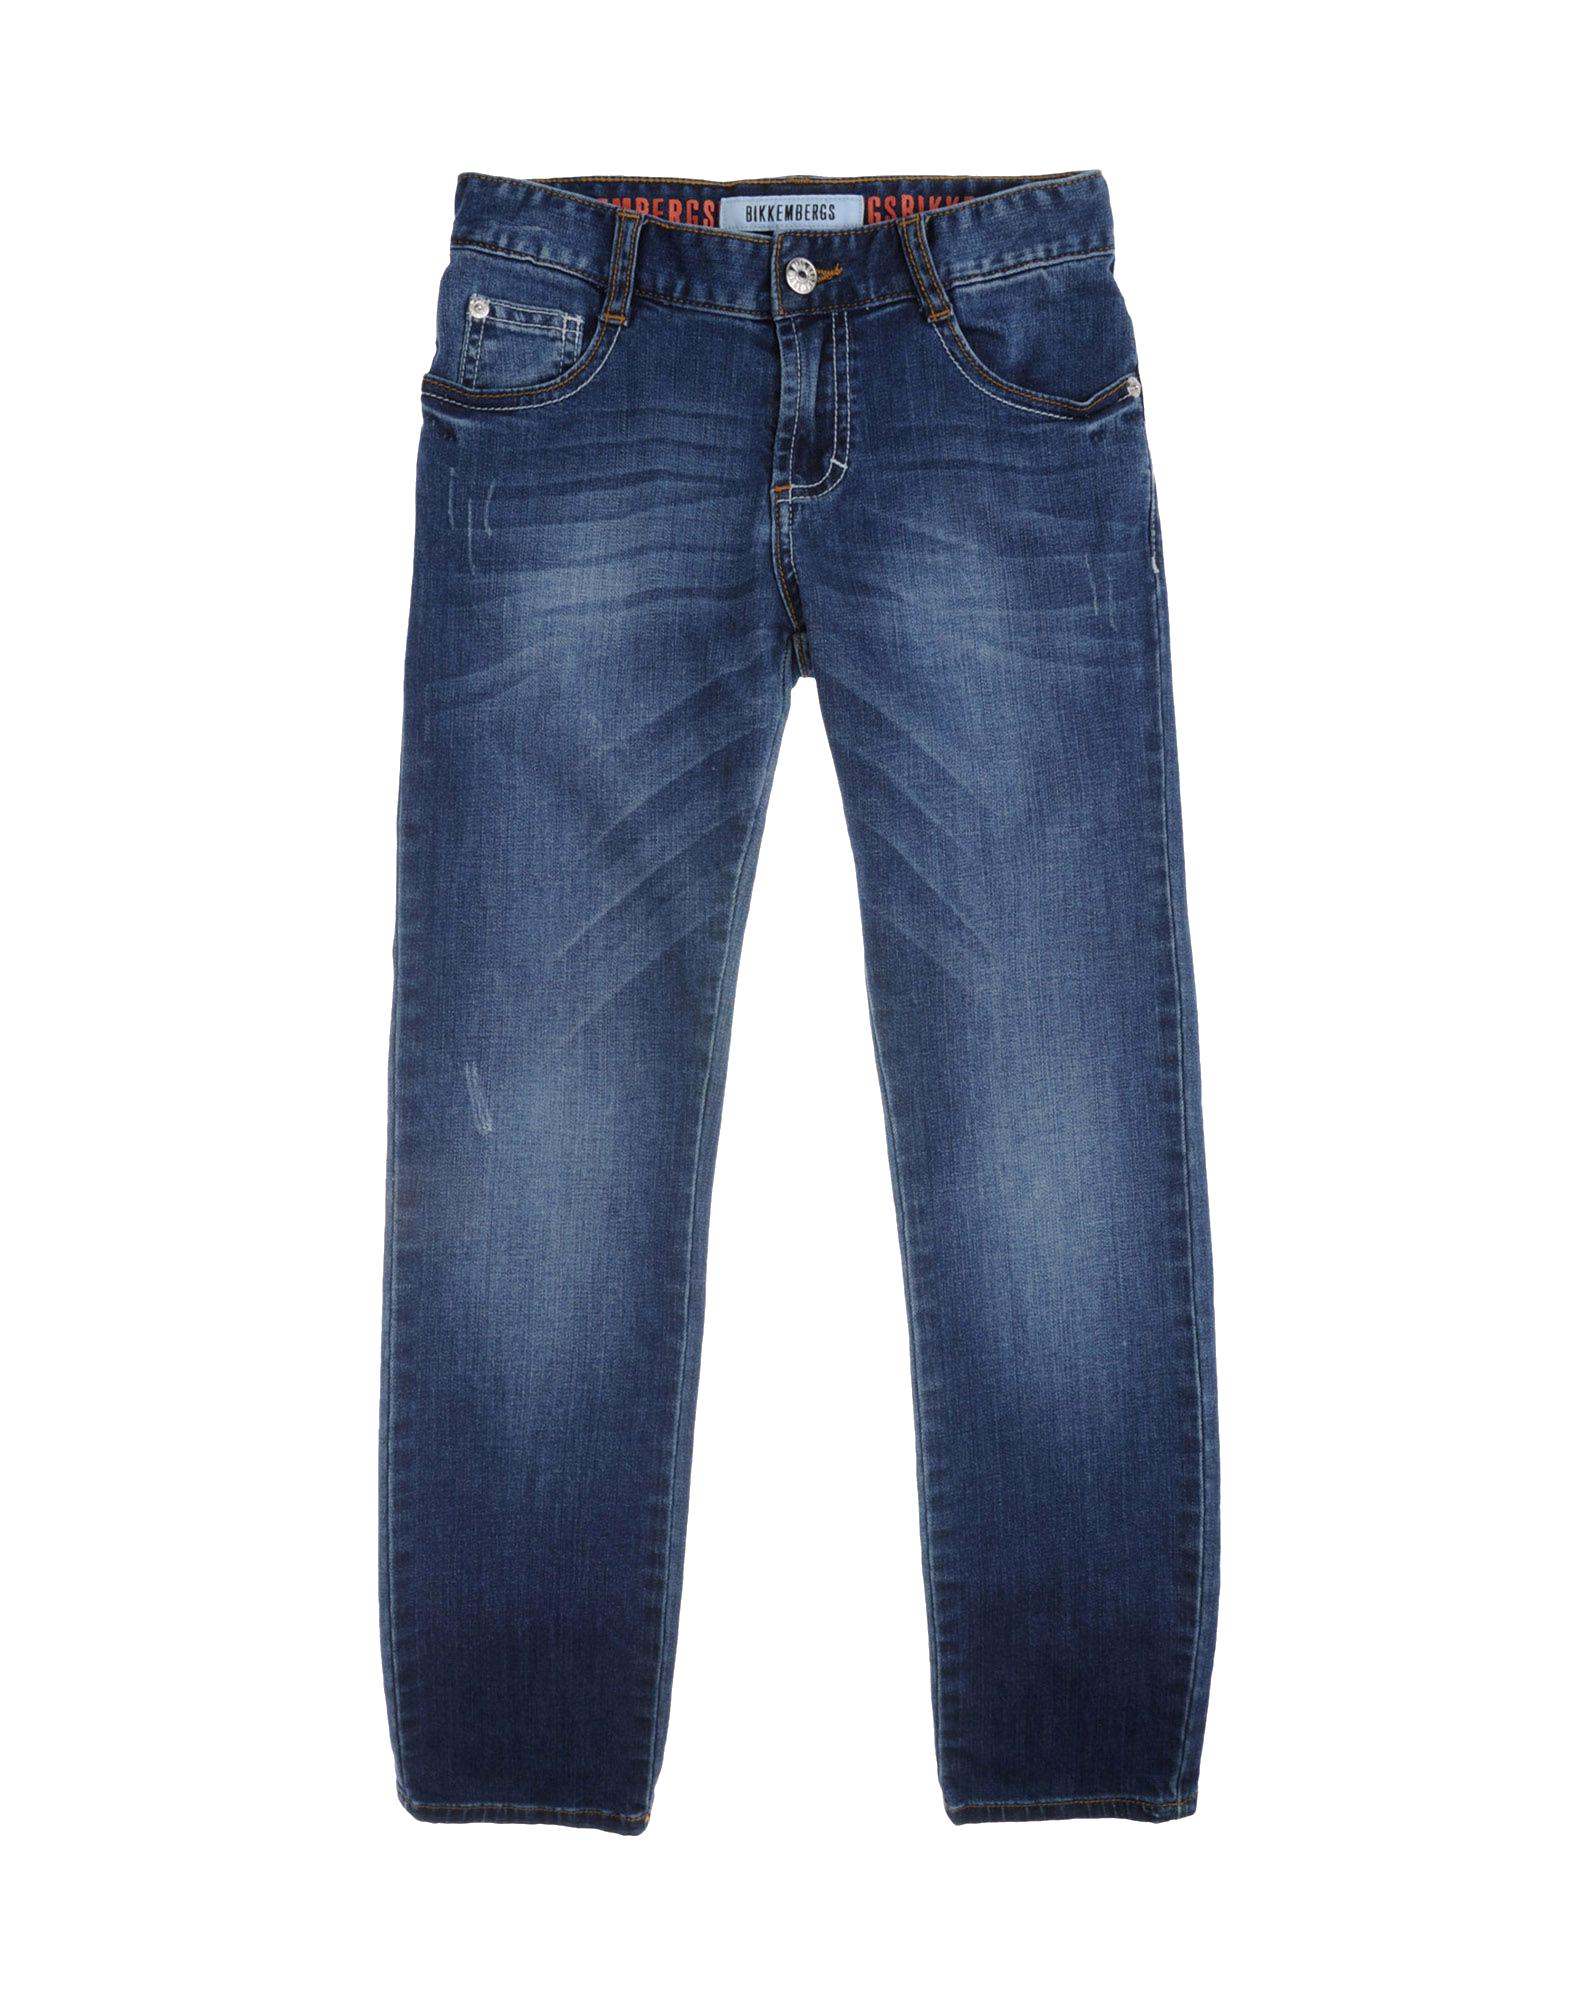 Png transparent images all. Clipart clothes jeans